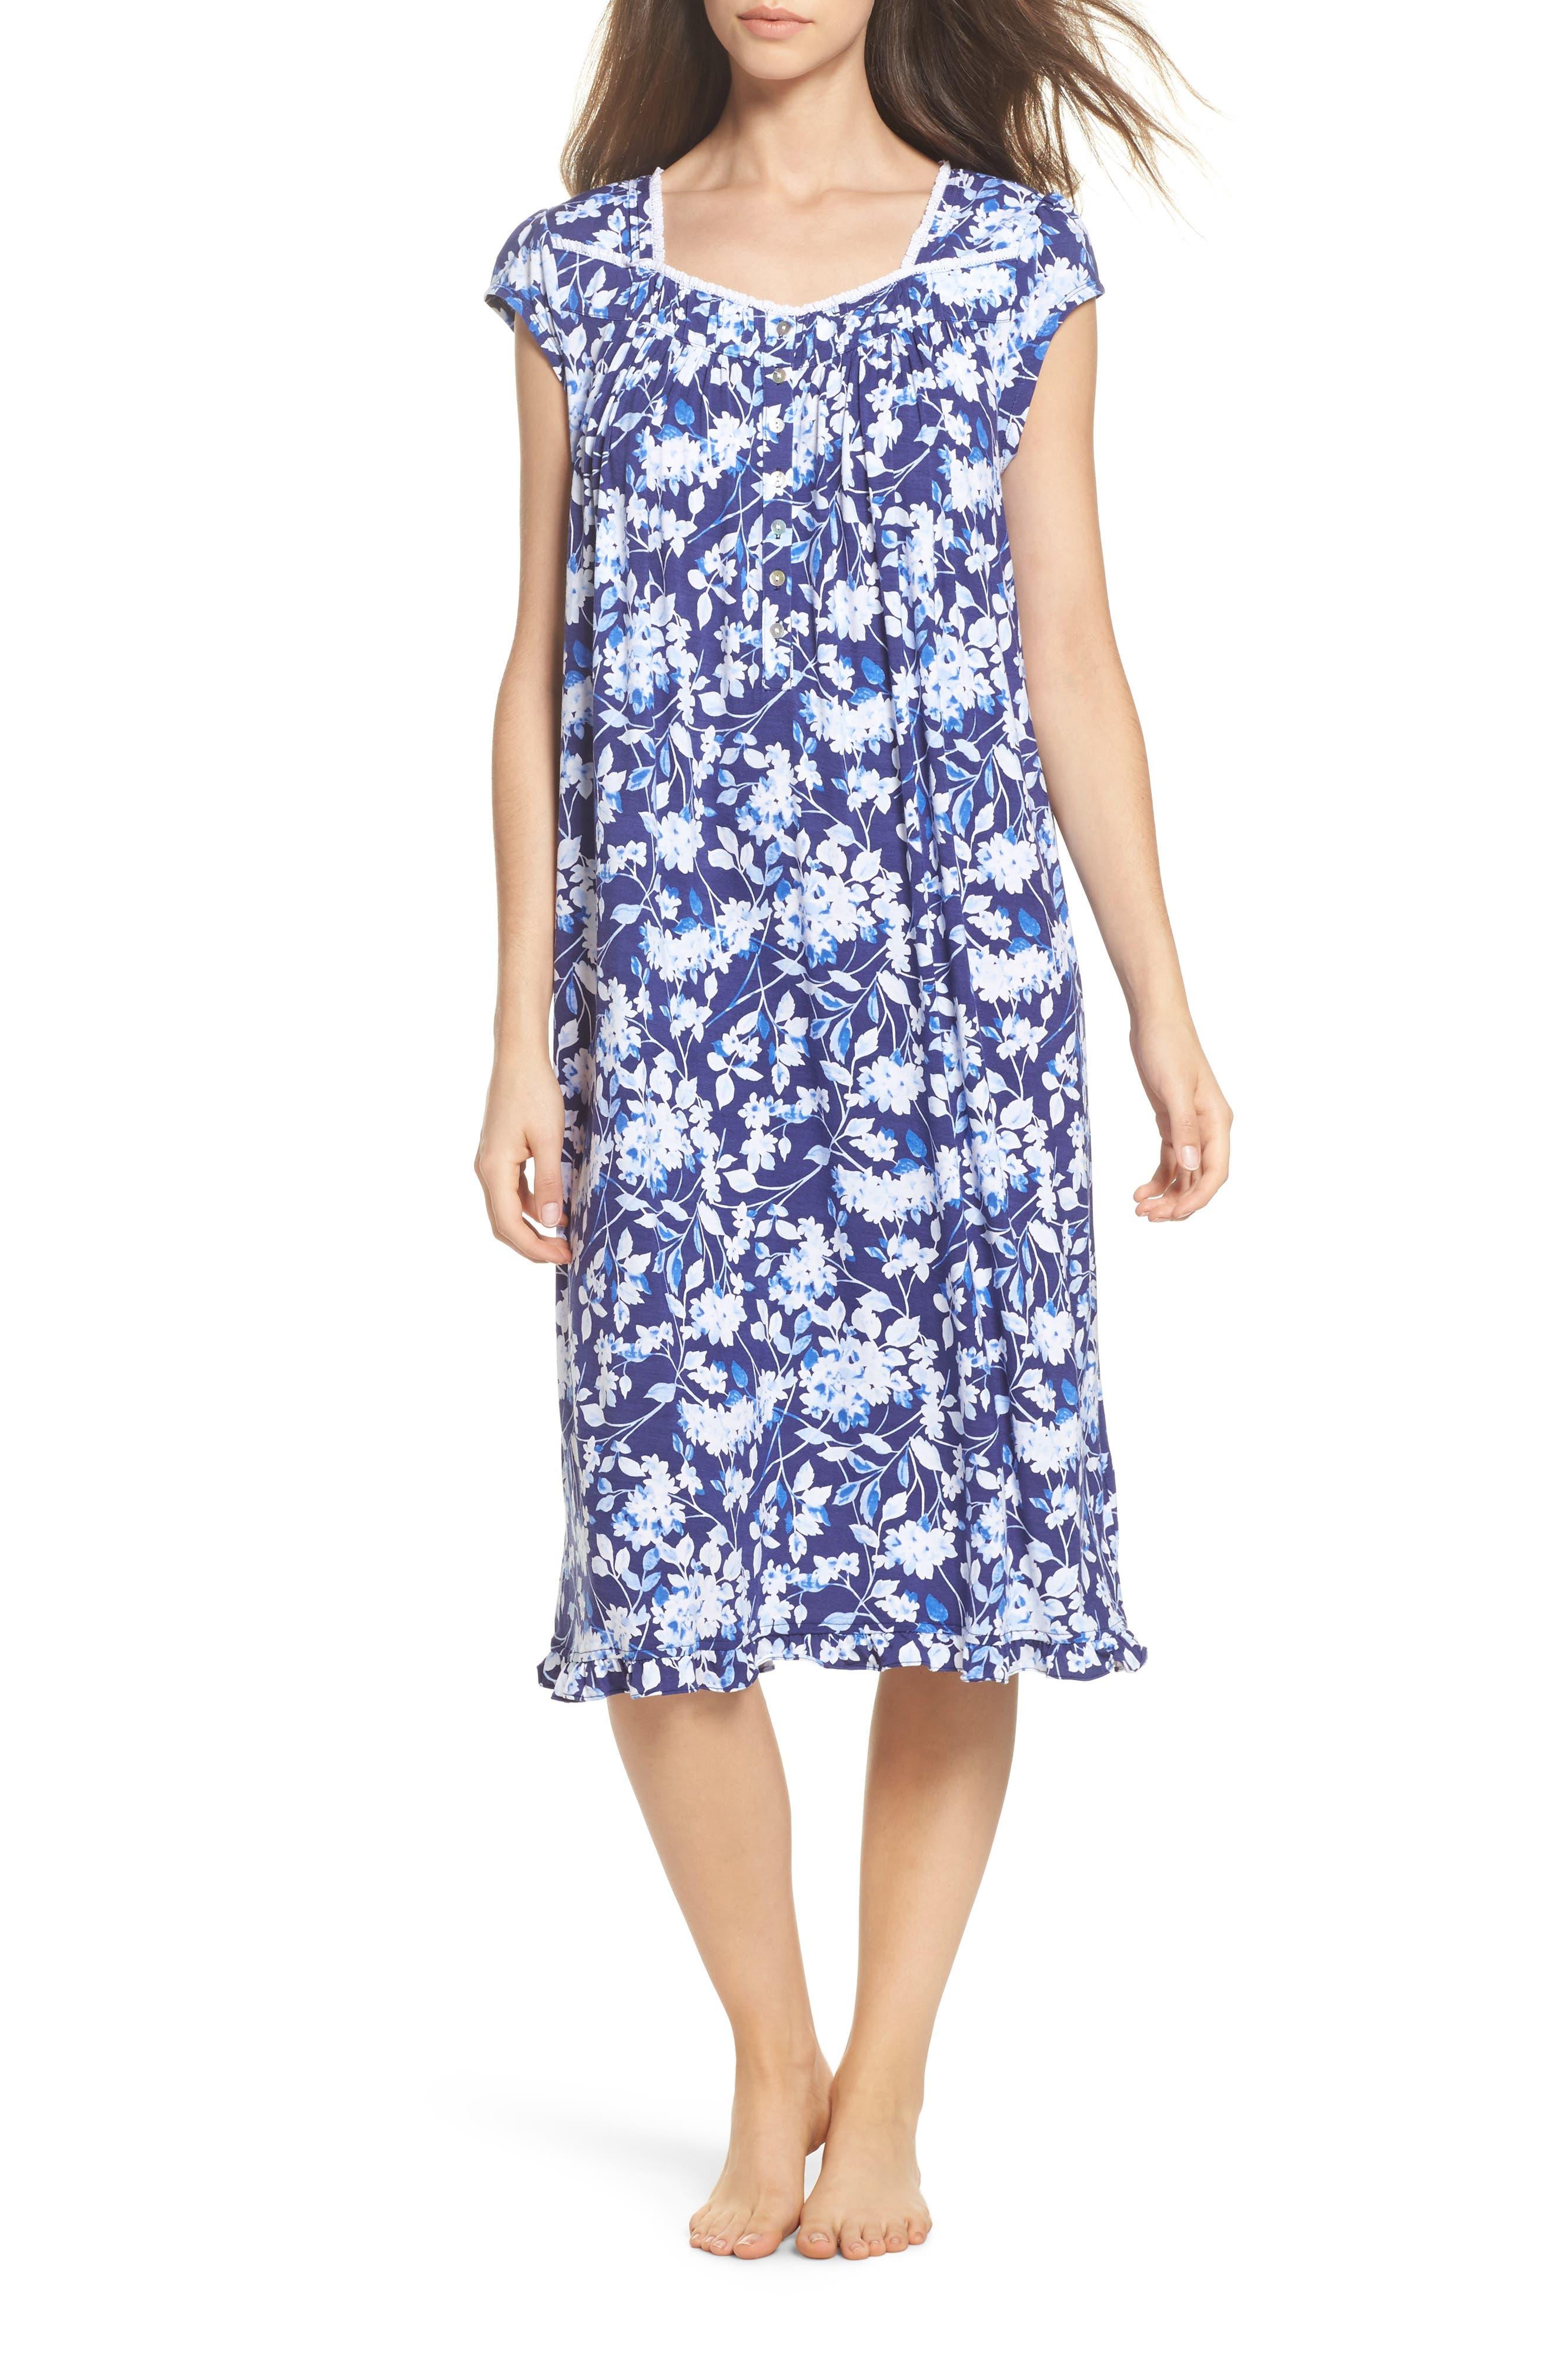 Waltz Nightgown,                             Main thumbnail 1, color,                             Blue Multi Floral